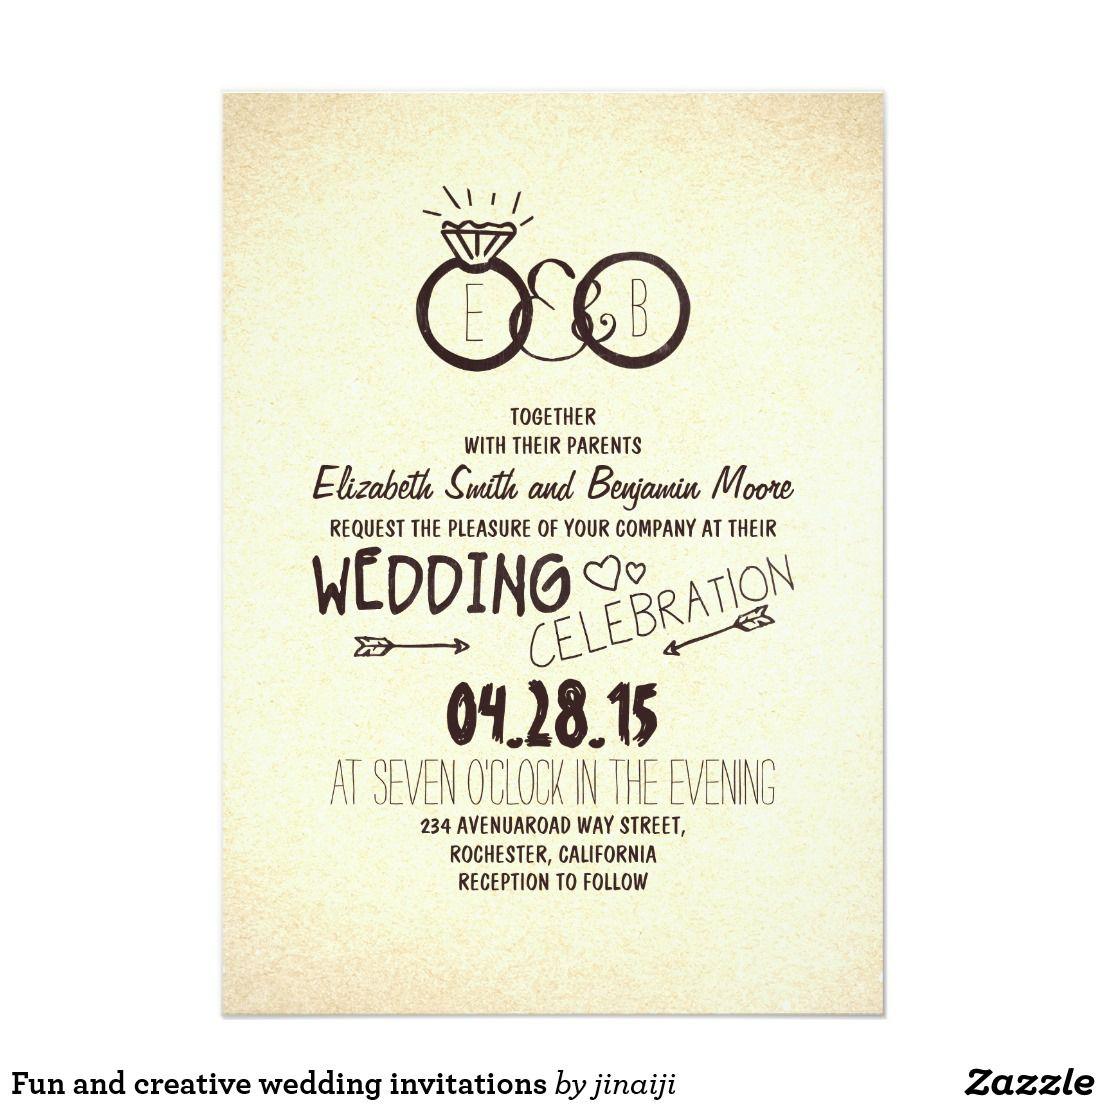 Pin by BrideKraft on Wedding Invitations | Pinterest | Weddings